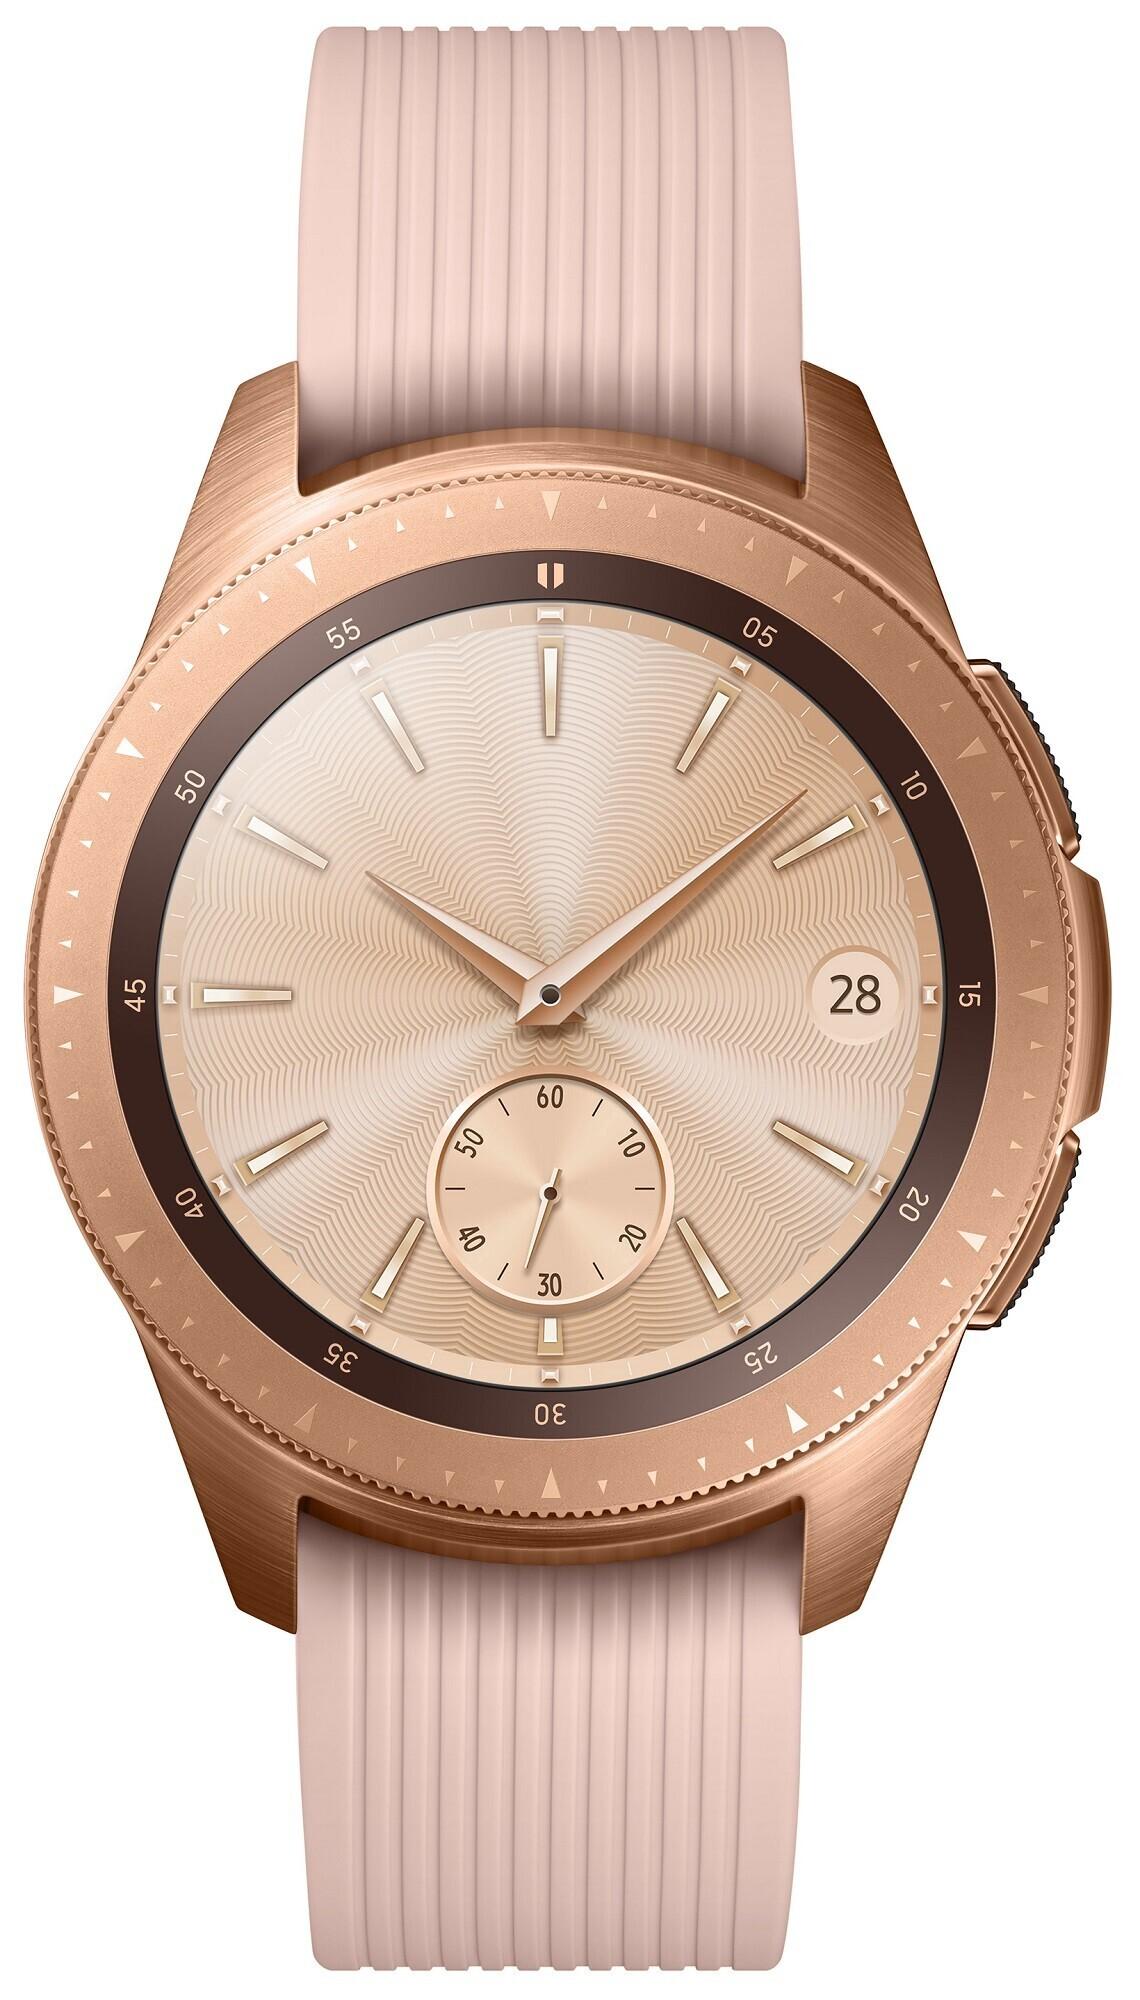 f2f62483 Смарт-часы Samsung Galaxy Watch 42mm Gold (SM-R810NZDASEK) купить в ...